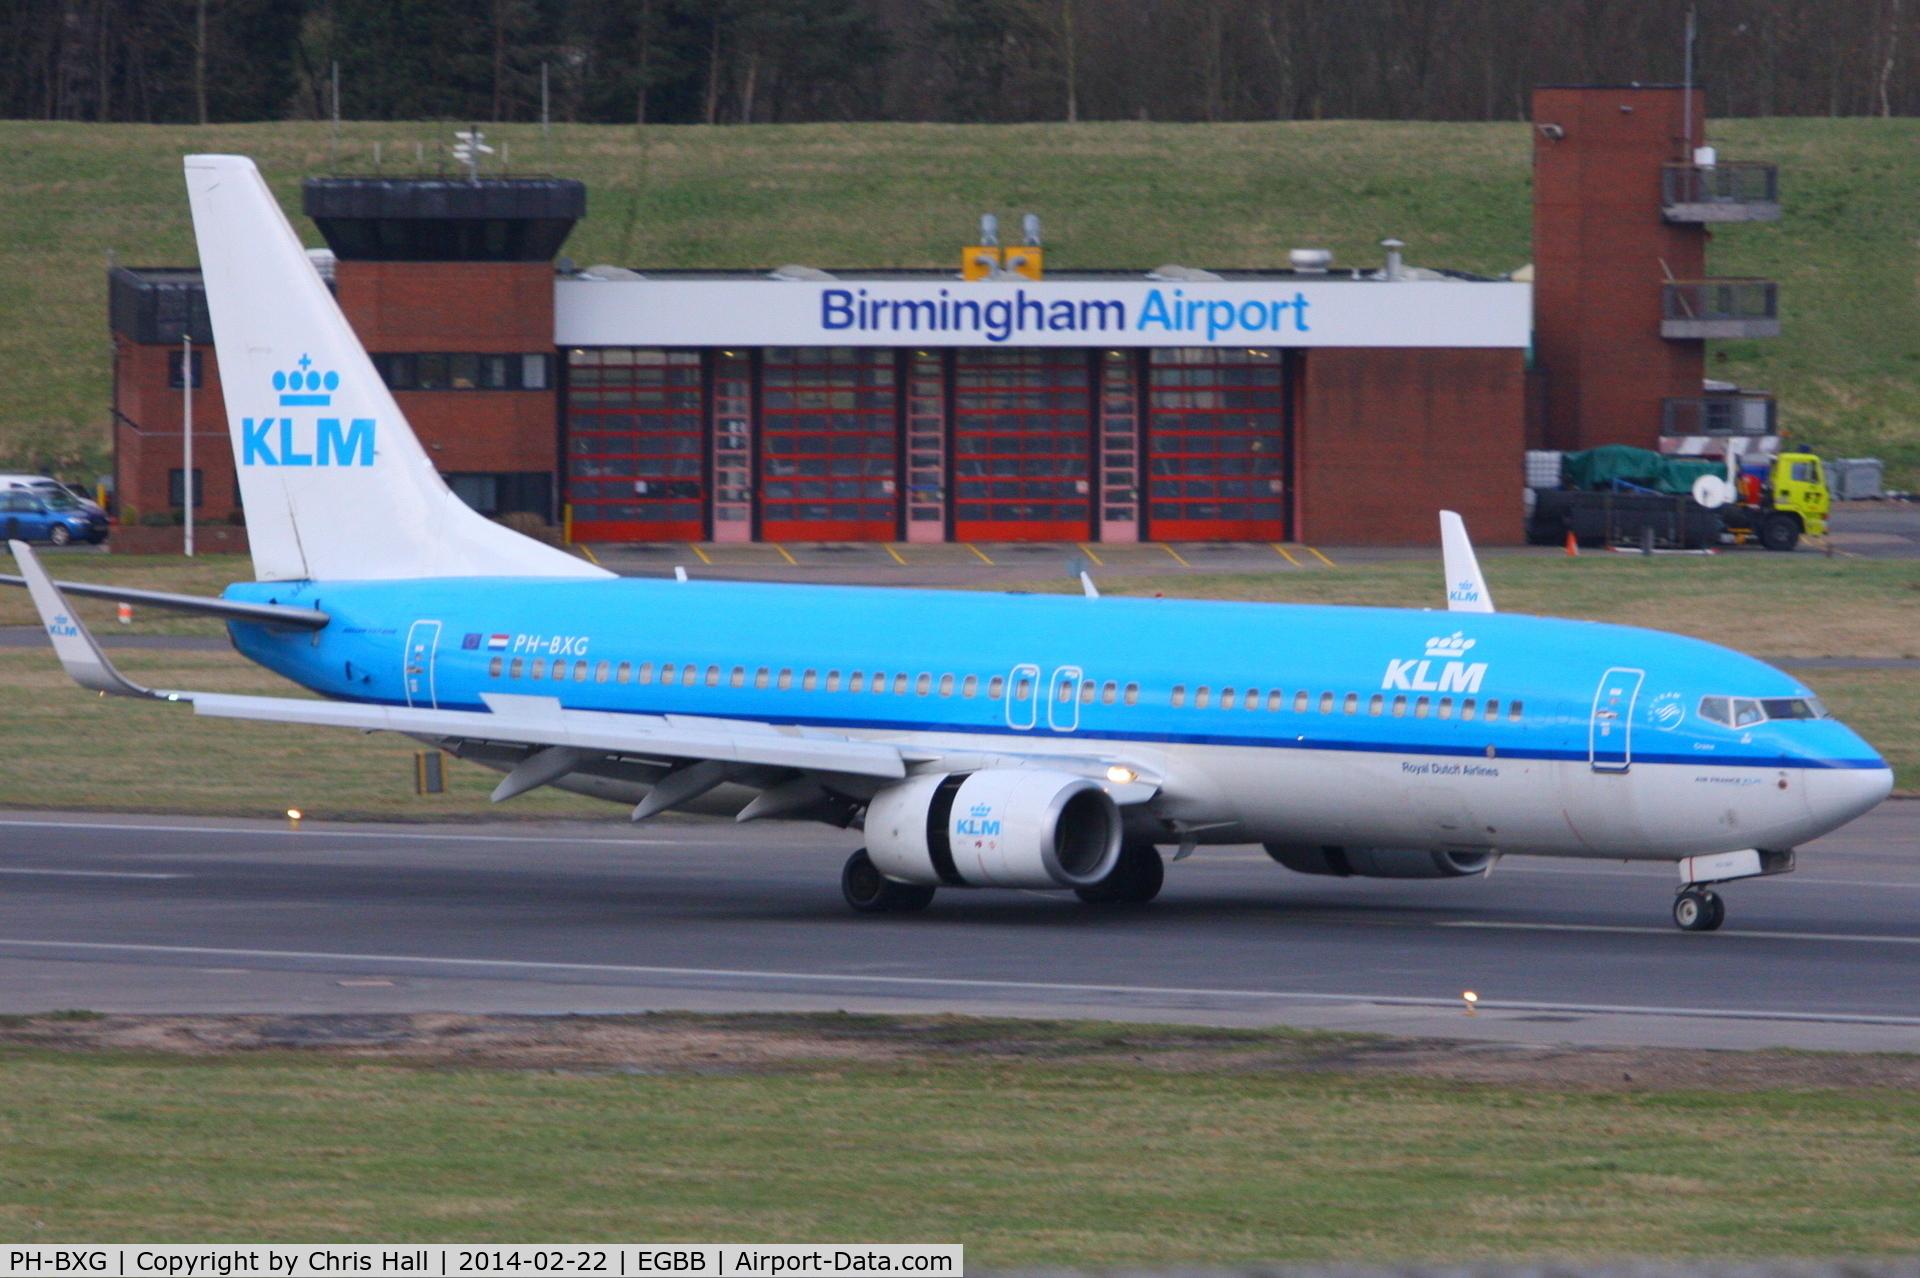 PH-BXG, 2000 Boeing 737-8K2 C/N 30357, KLM Royal Dutch Airlines